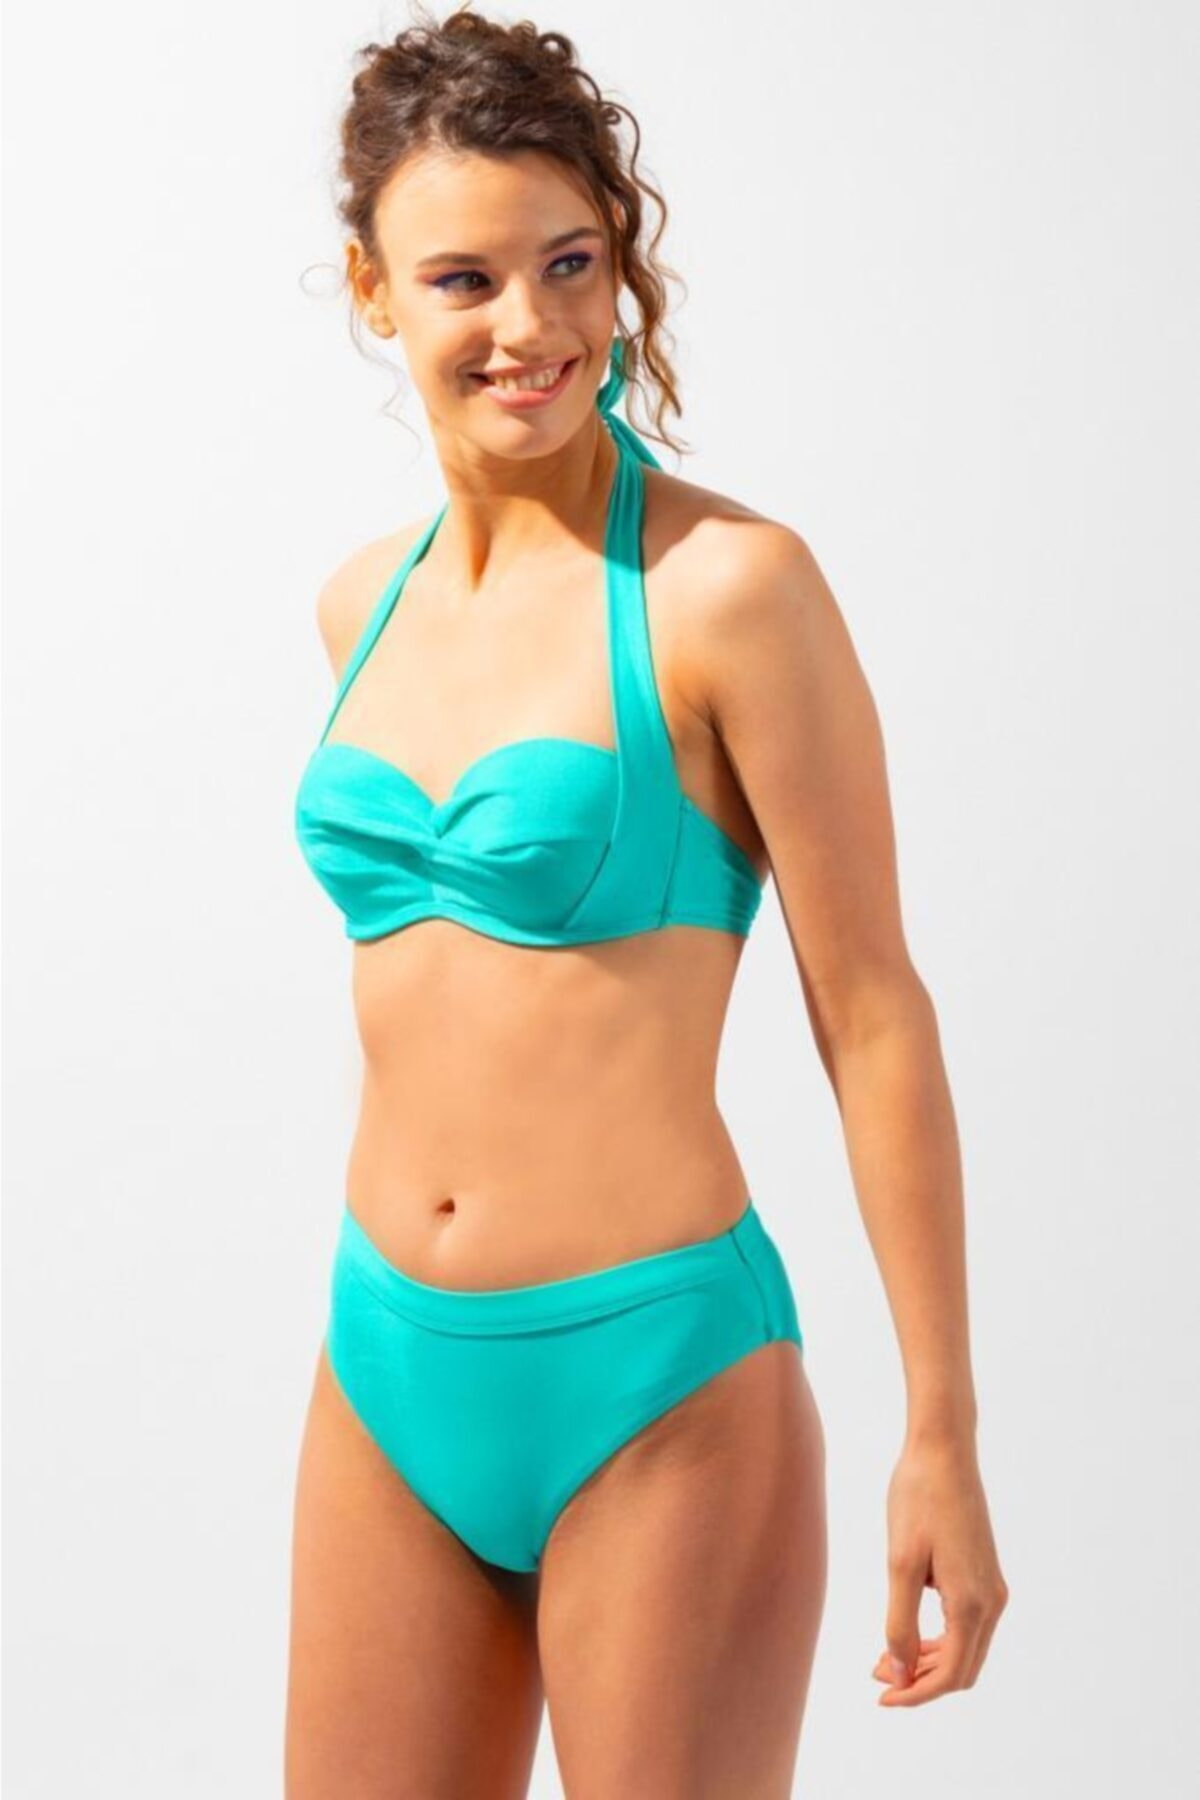 Katia&Bony Teal Tales Düz Ip Askılı Kadın Bikini-yeşil 1